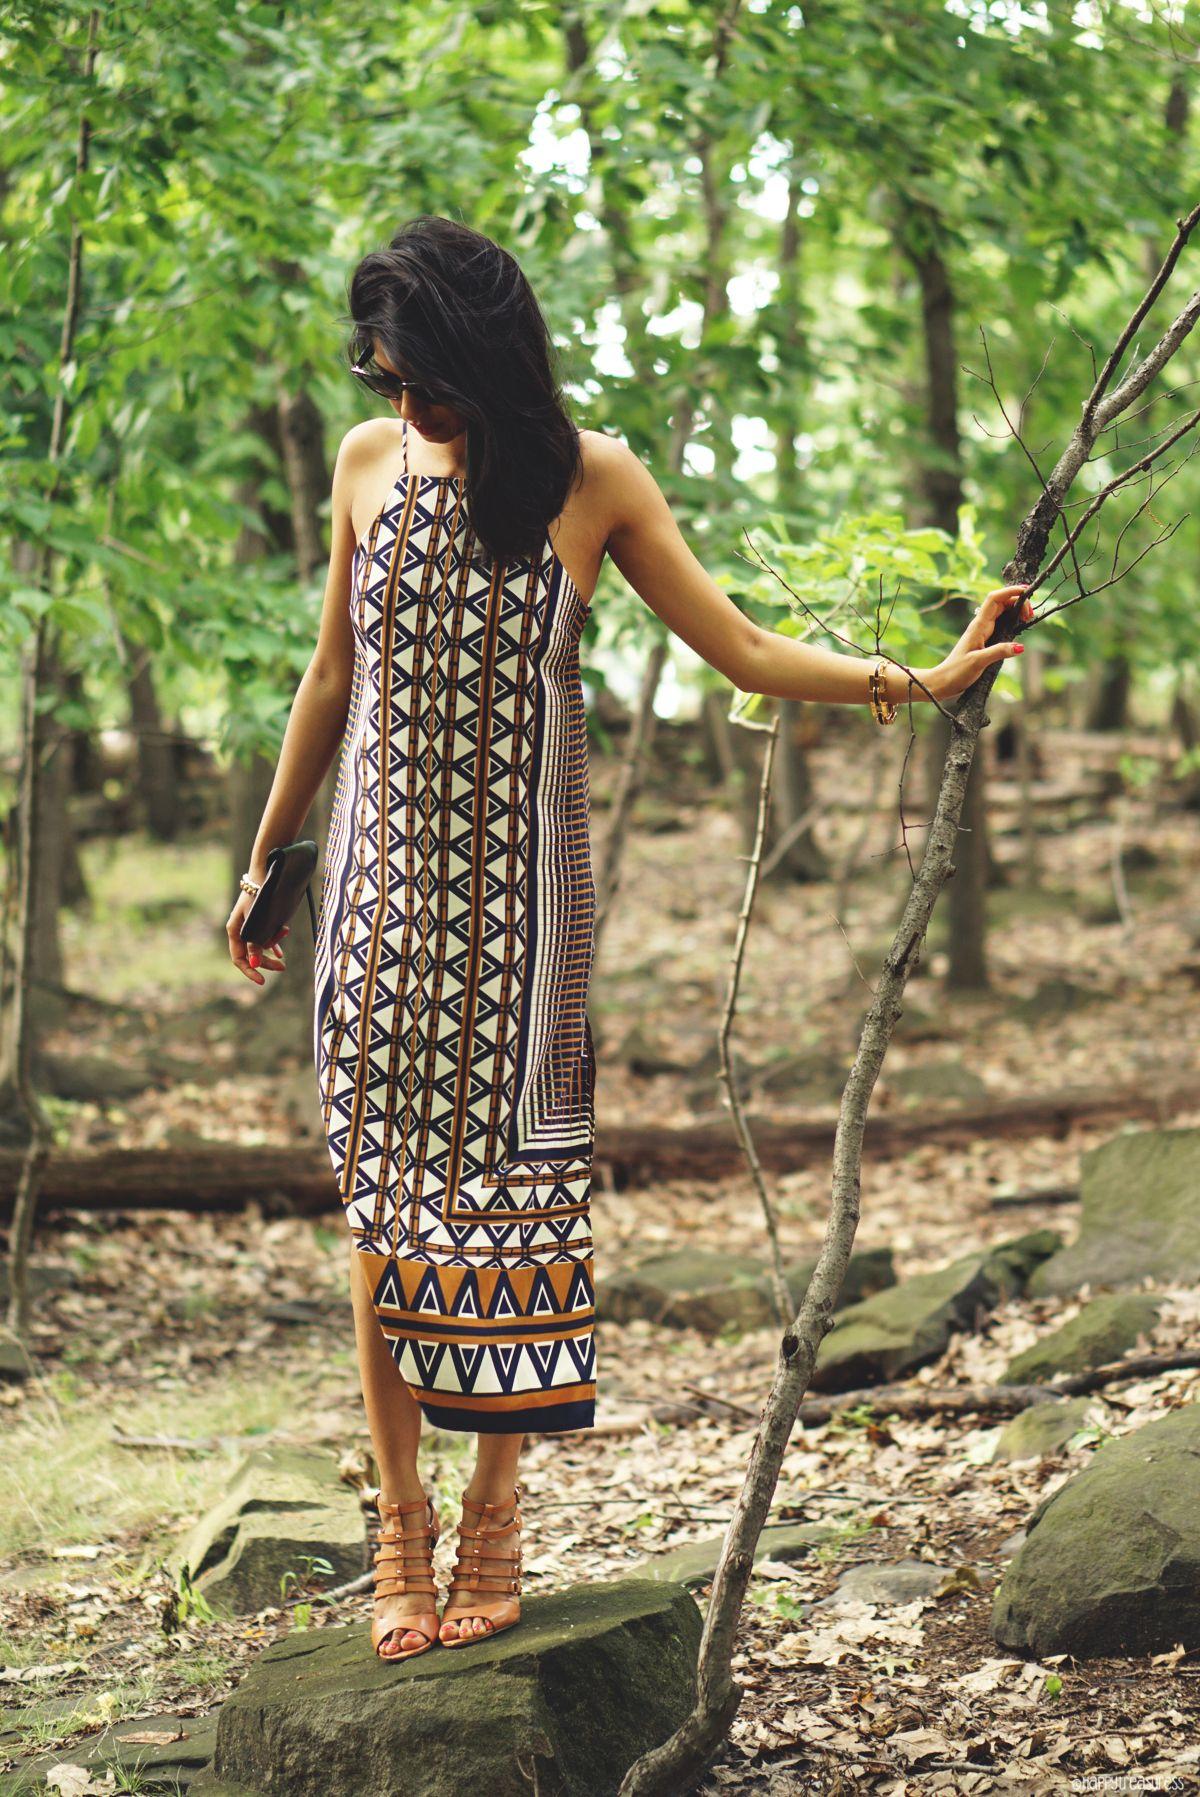 Top Shop Summer shift dress with ivanka trump heels | Summer outfit | Top shop dress